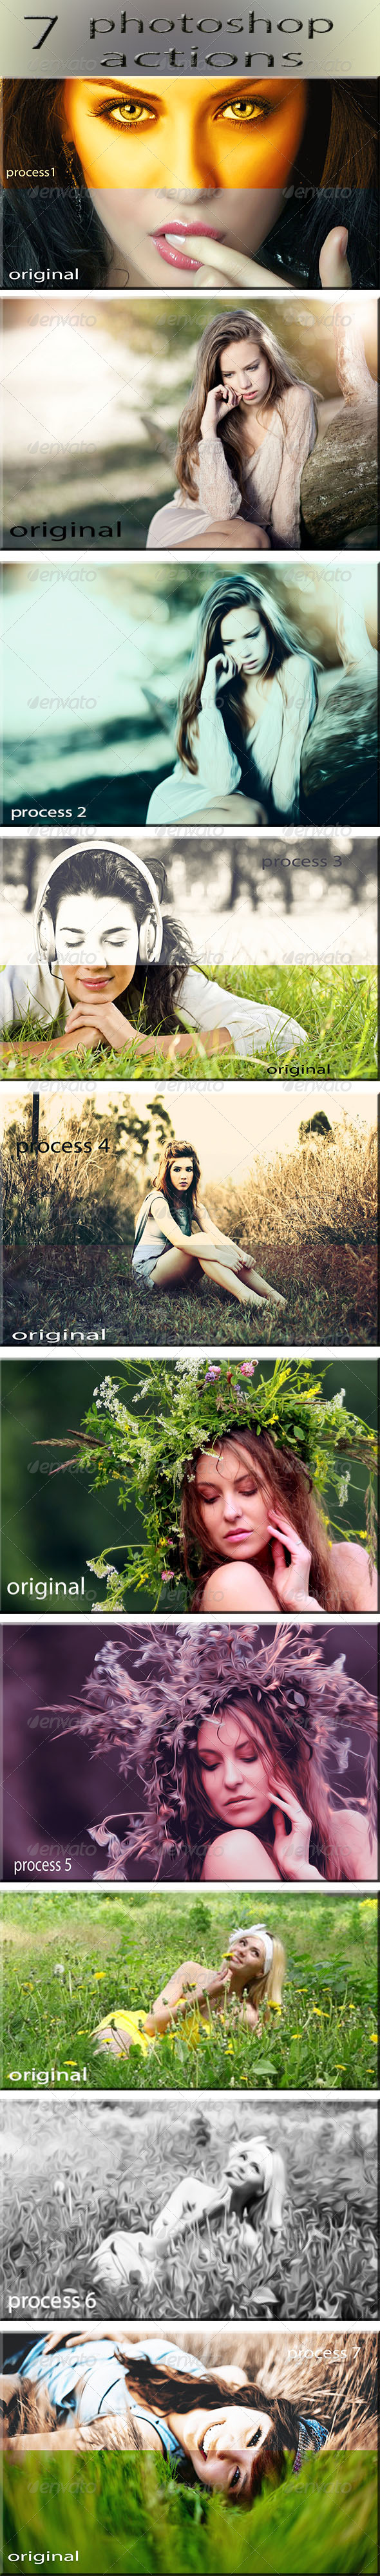 GraphicRiver 7 Photoshop Actions 7778243